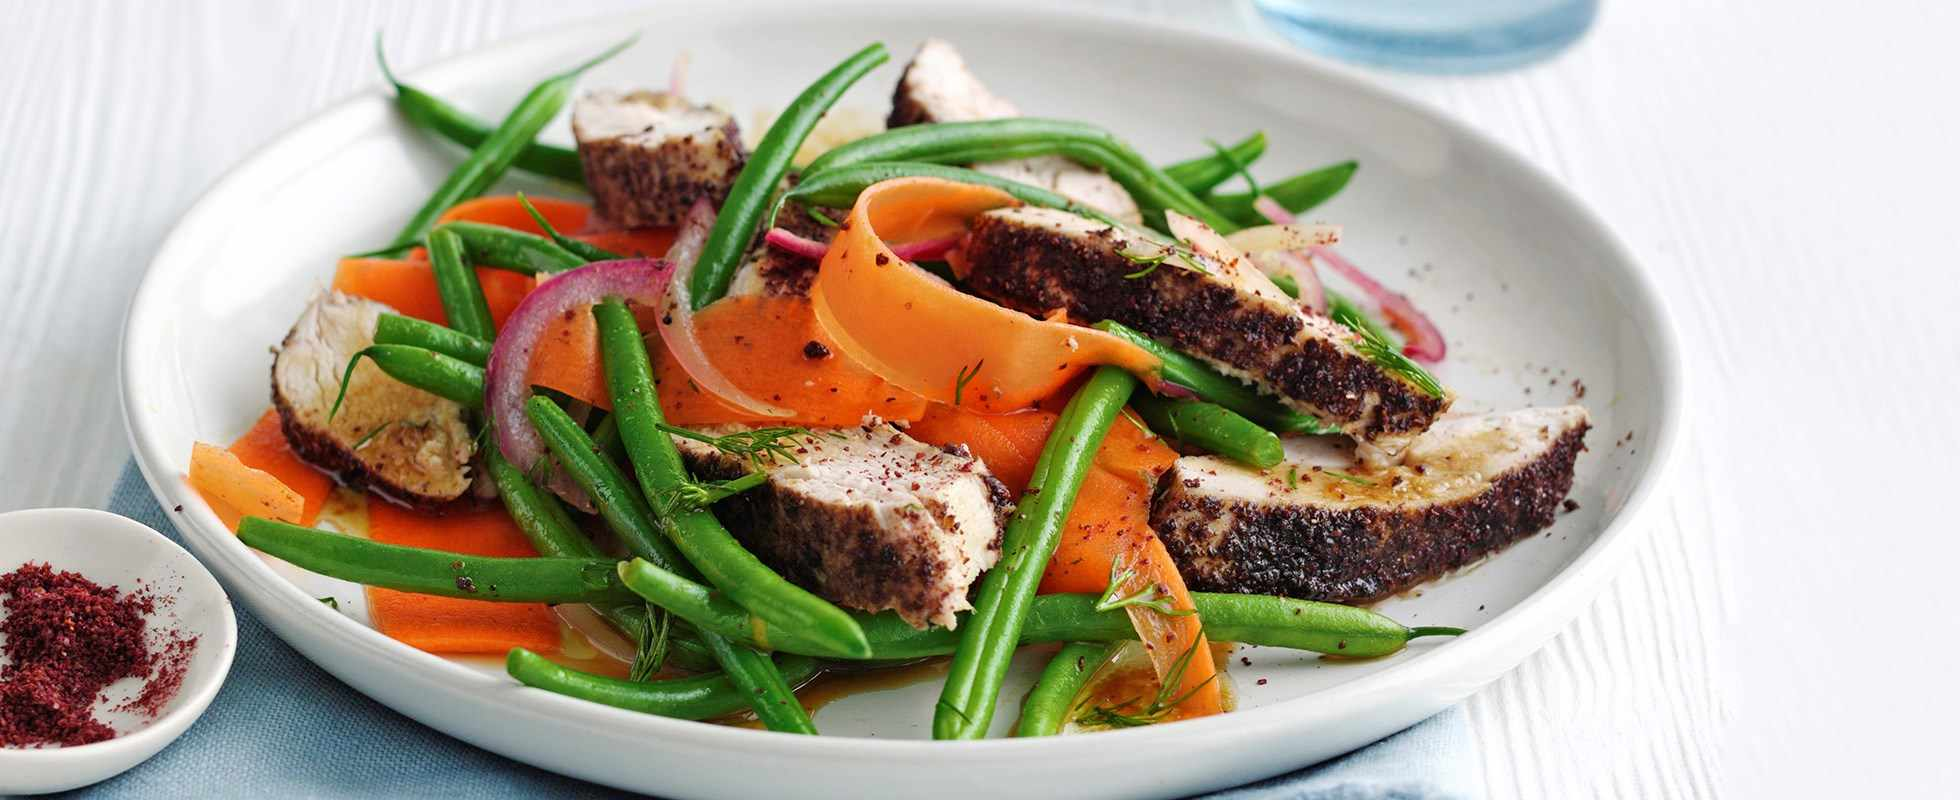 Sumac Chicken Recipe with Green Bean Salad